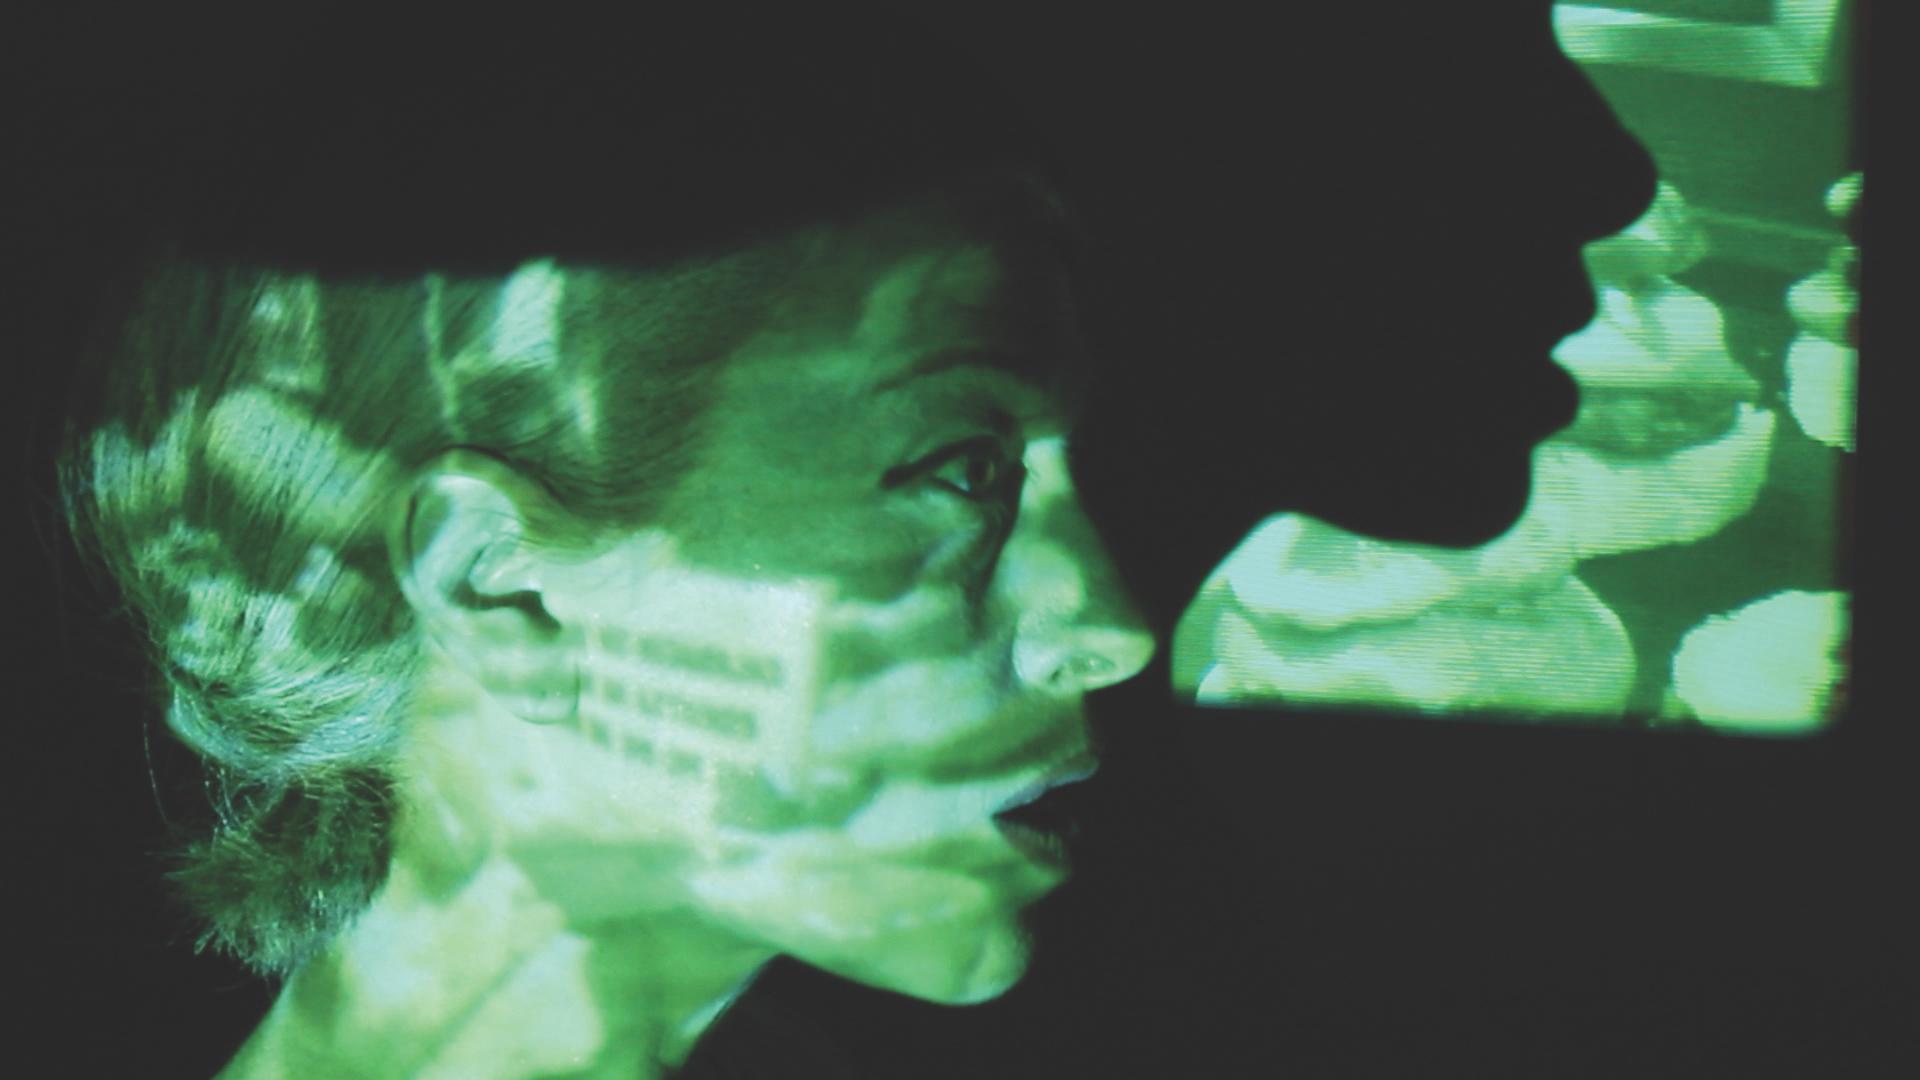 Sue Dodd, Location 2 , Filming the people, video production still, digital print, 73 x 43cm